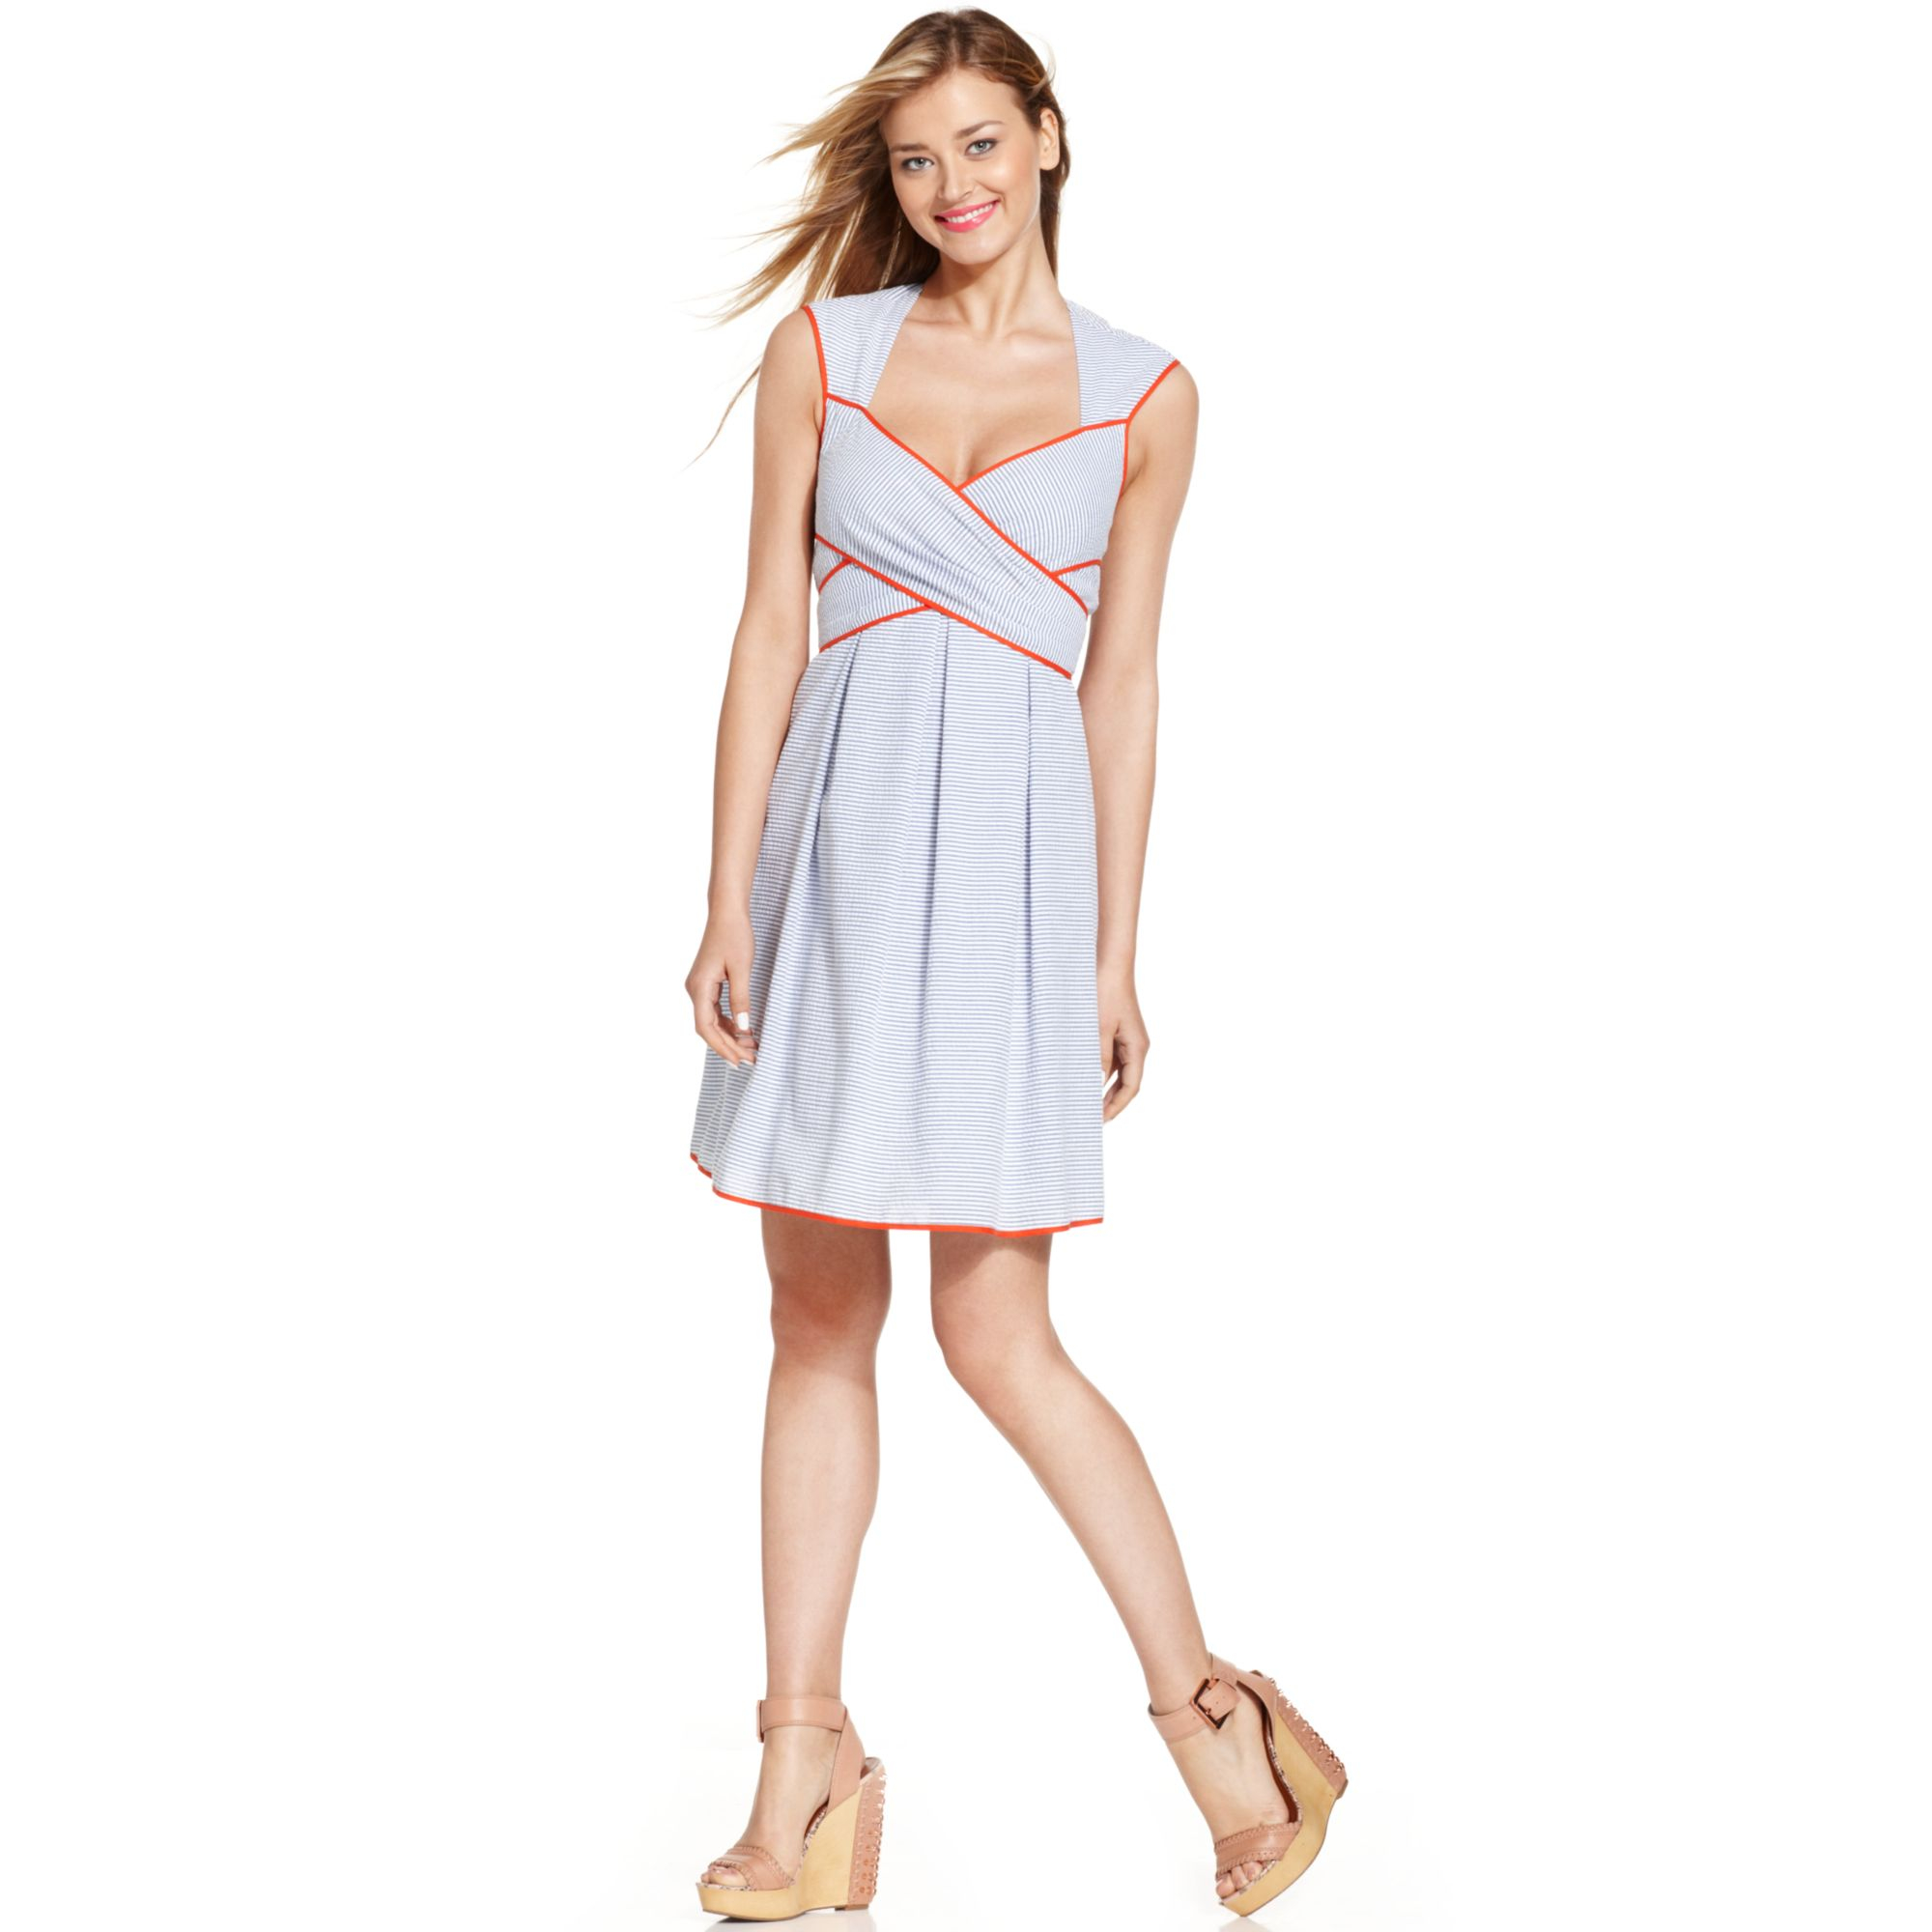 Lyst - Jessica Simpson Contrast Trim Seersucker Dress in Blue